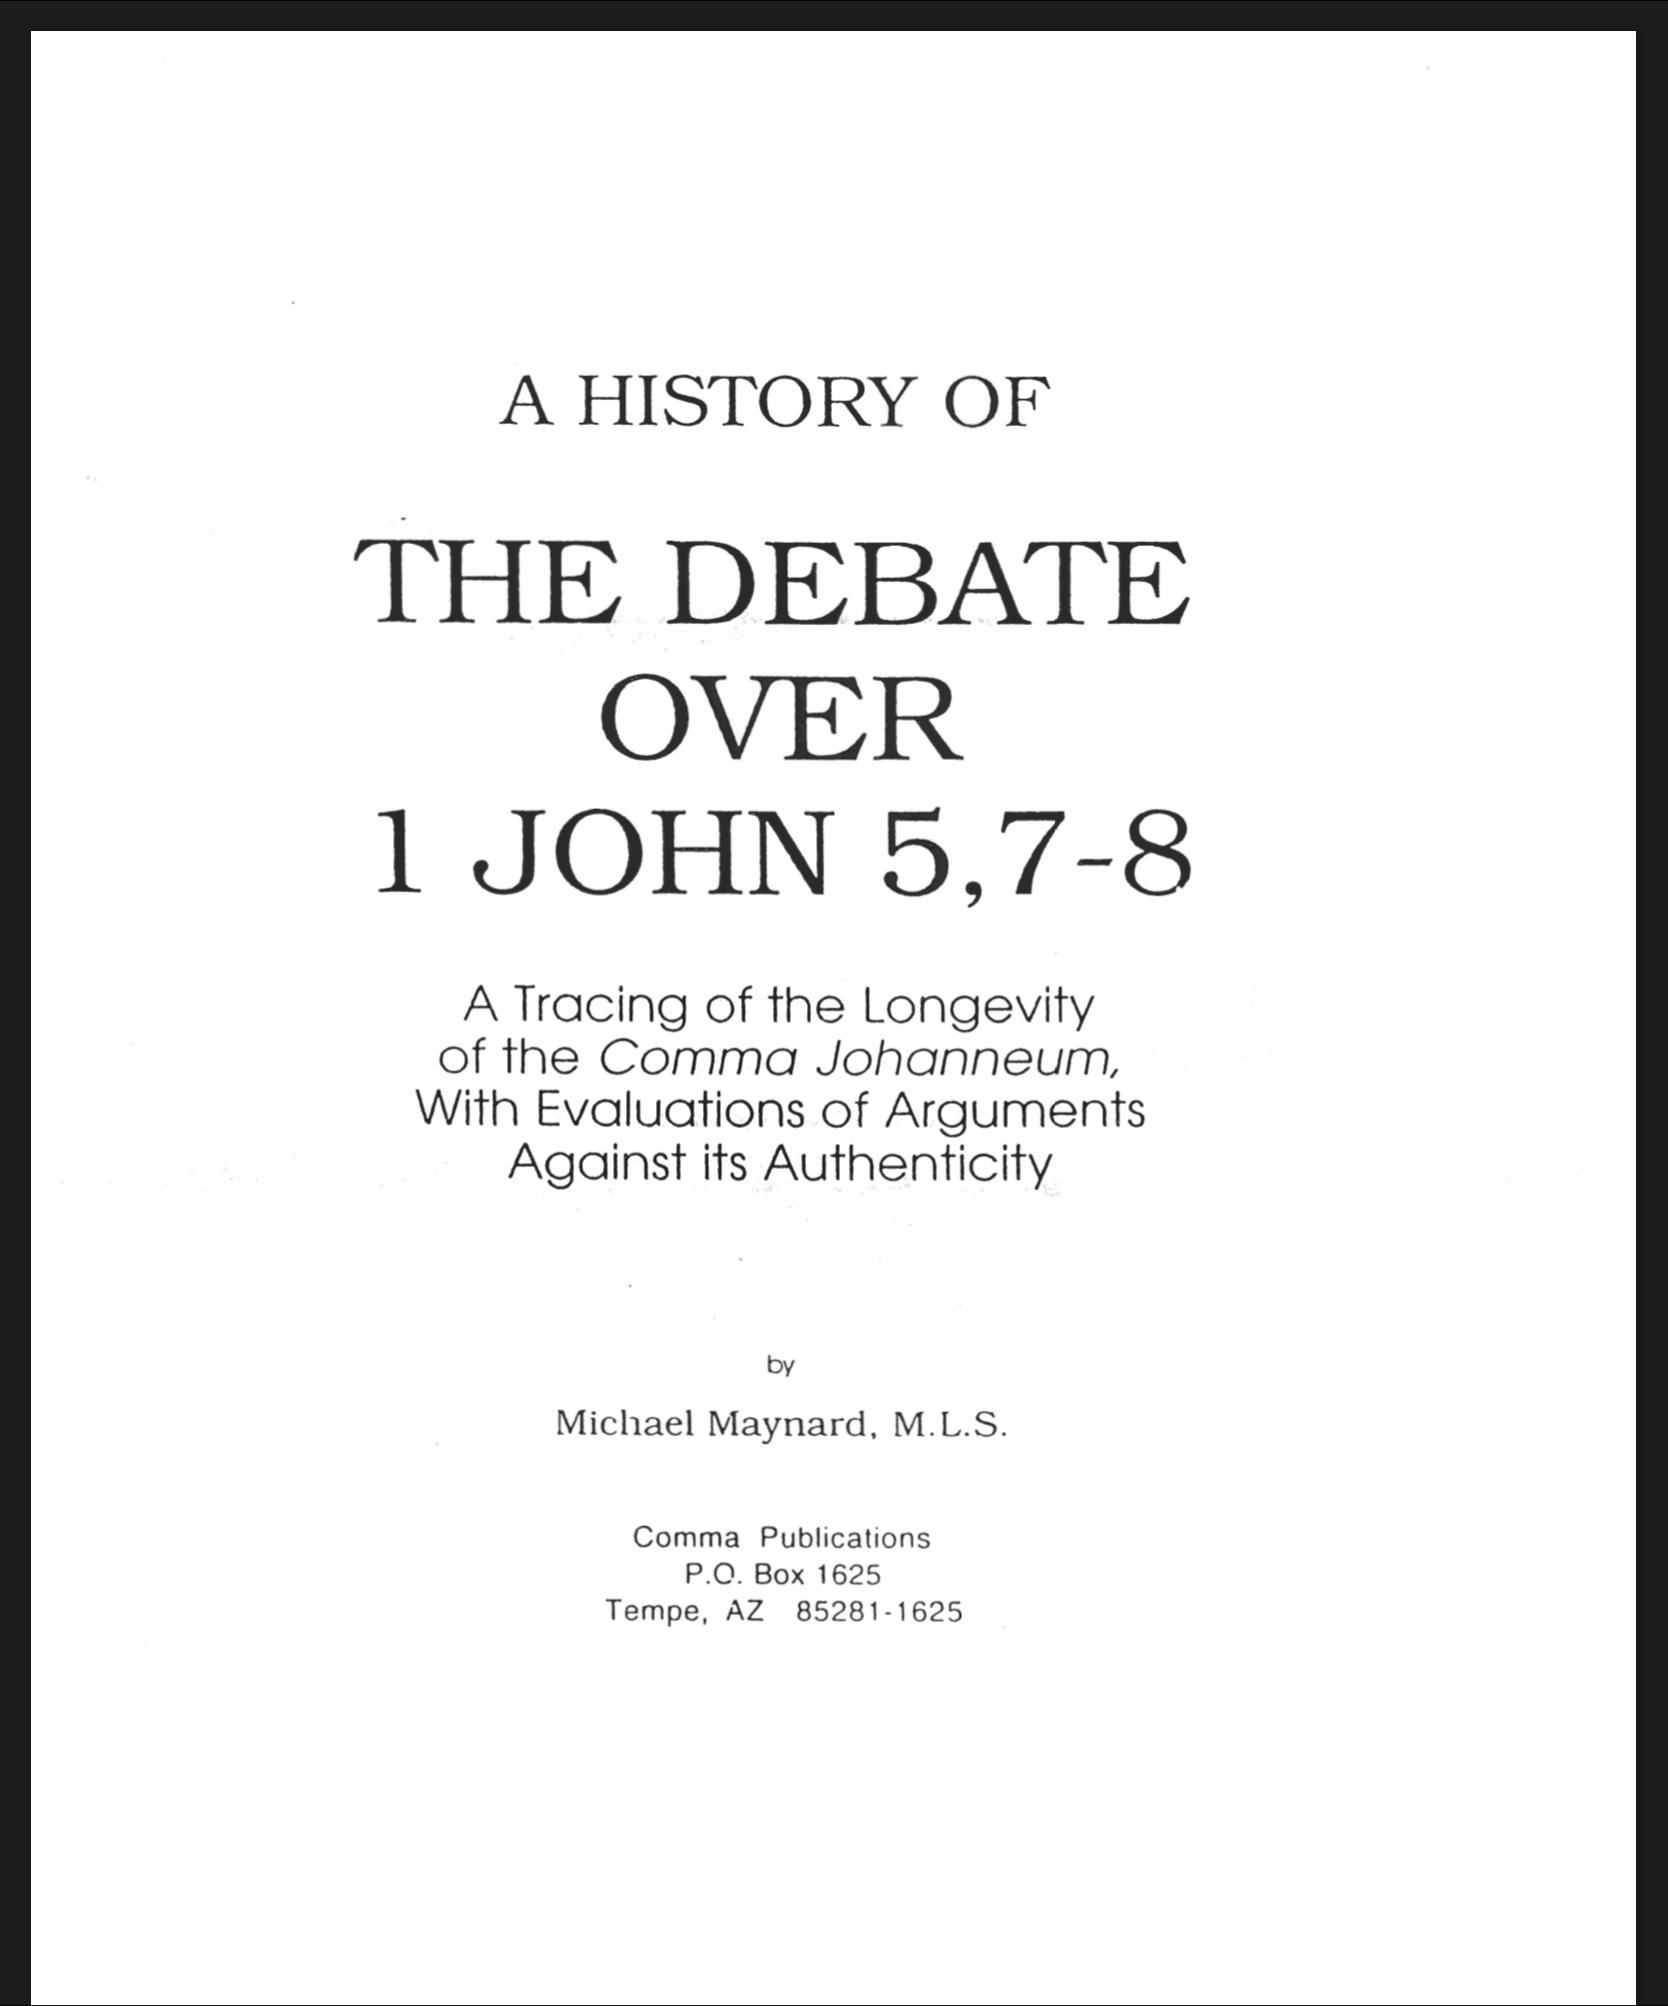 History Over the Debate of 1 John 5:7,8